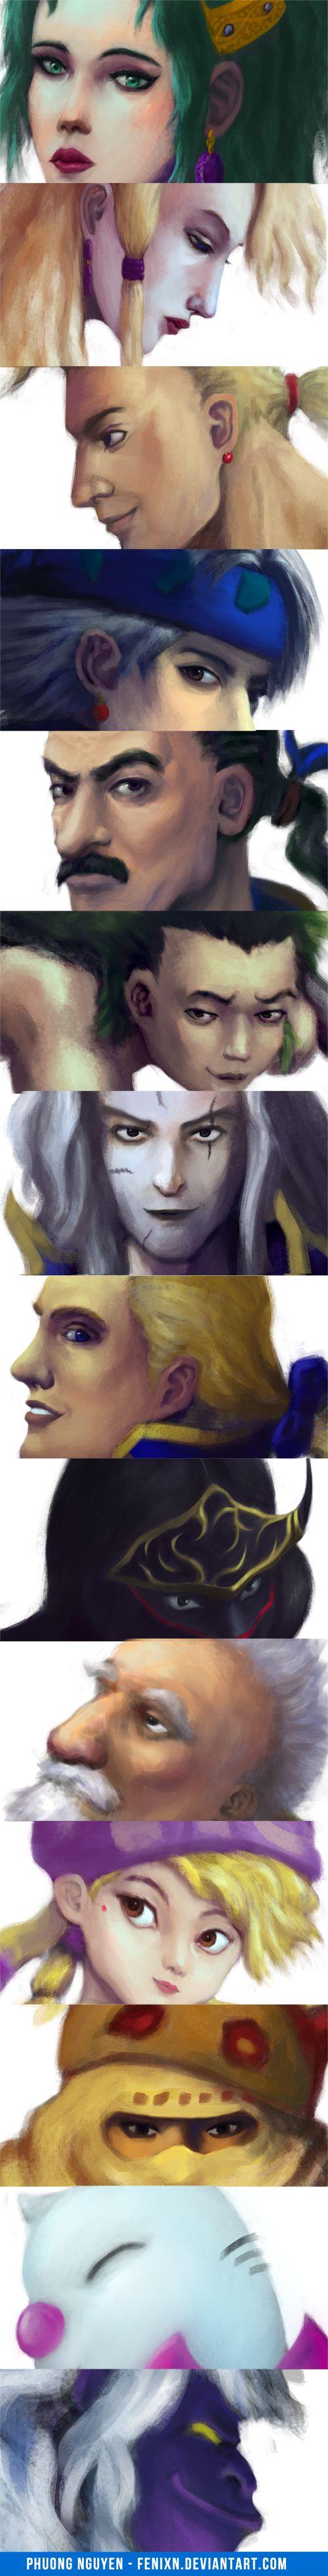 Final Fantasy 6 Character Portraits